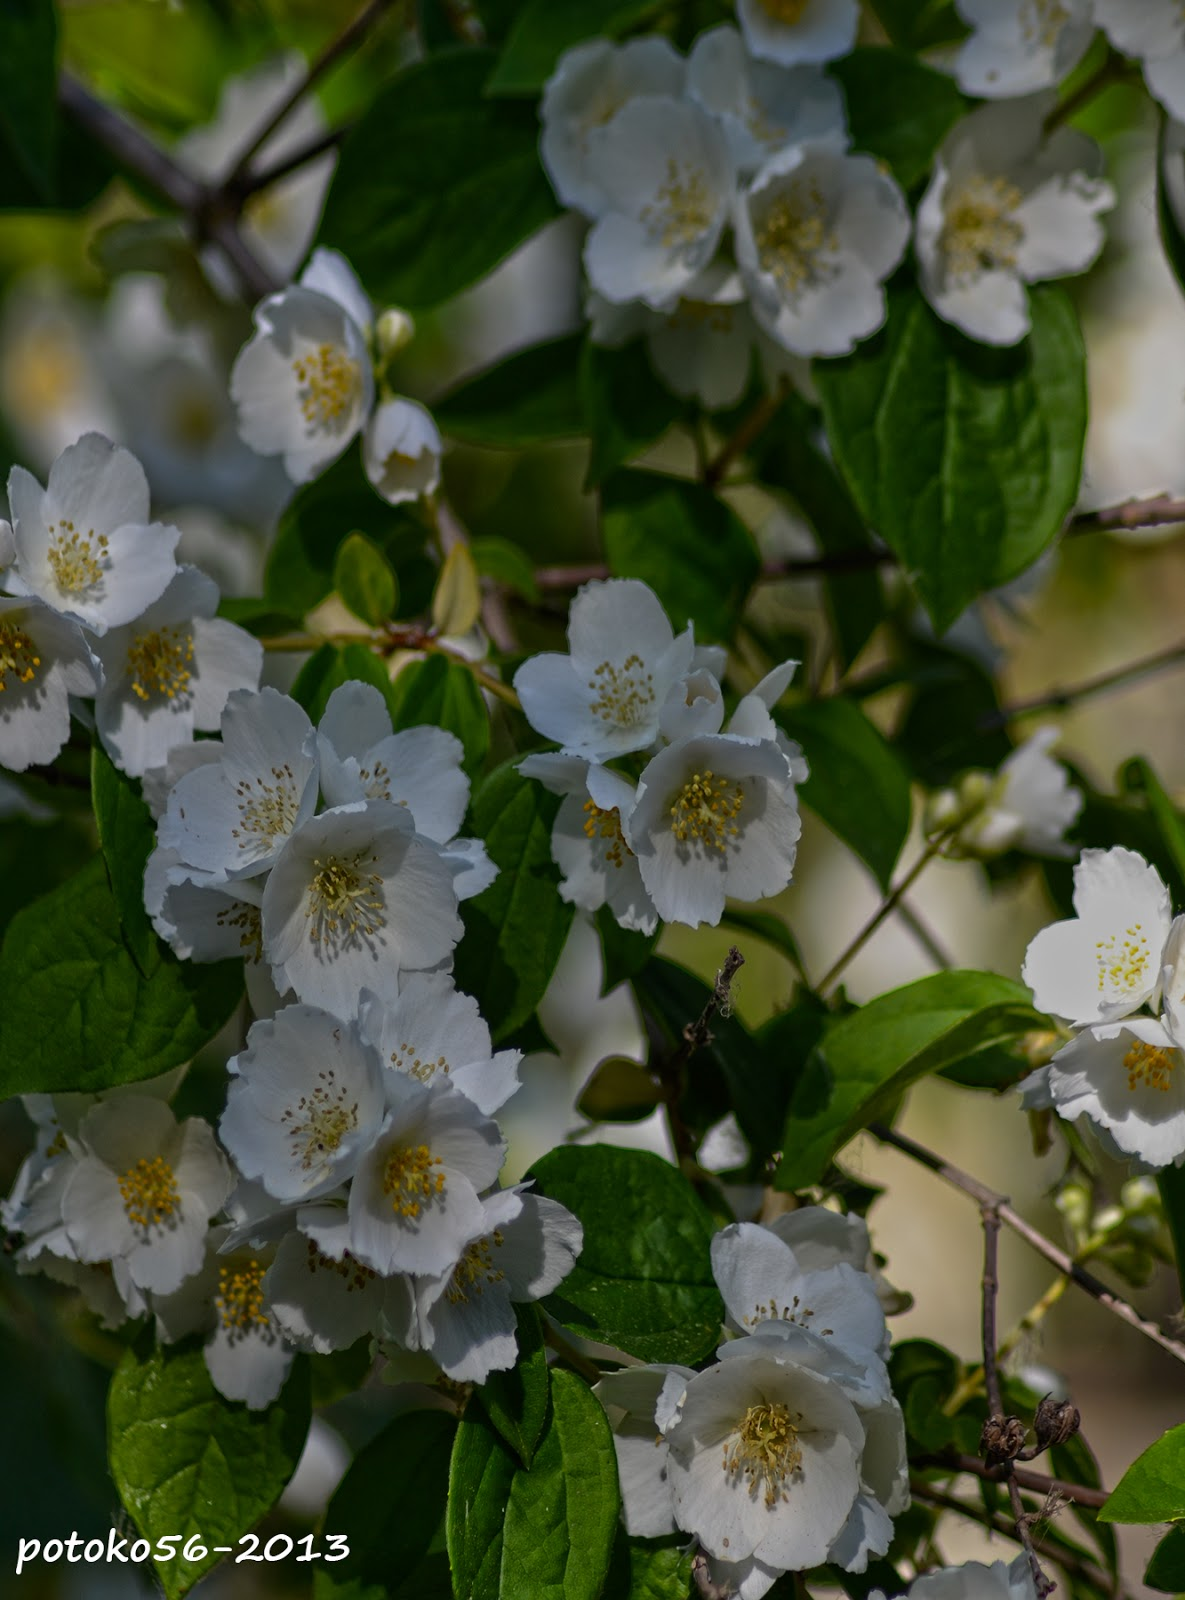 Arbol en flor Jardin Botánico Rota